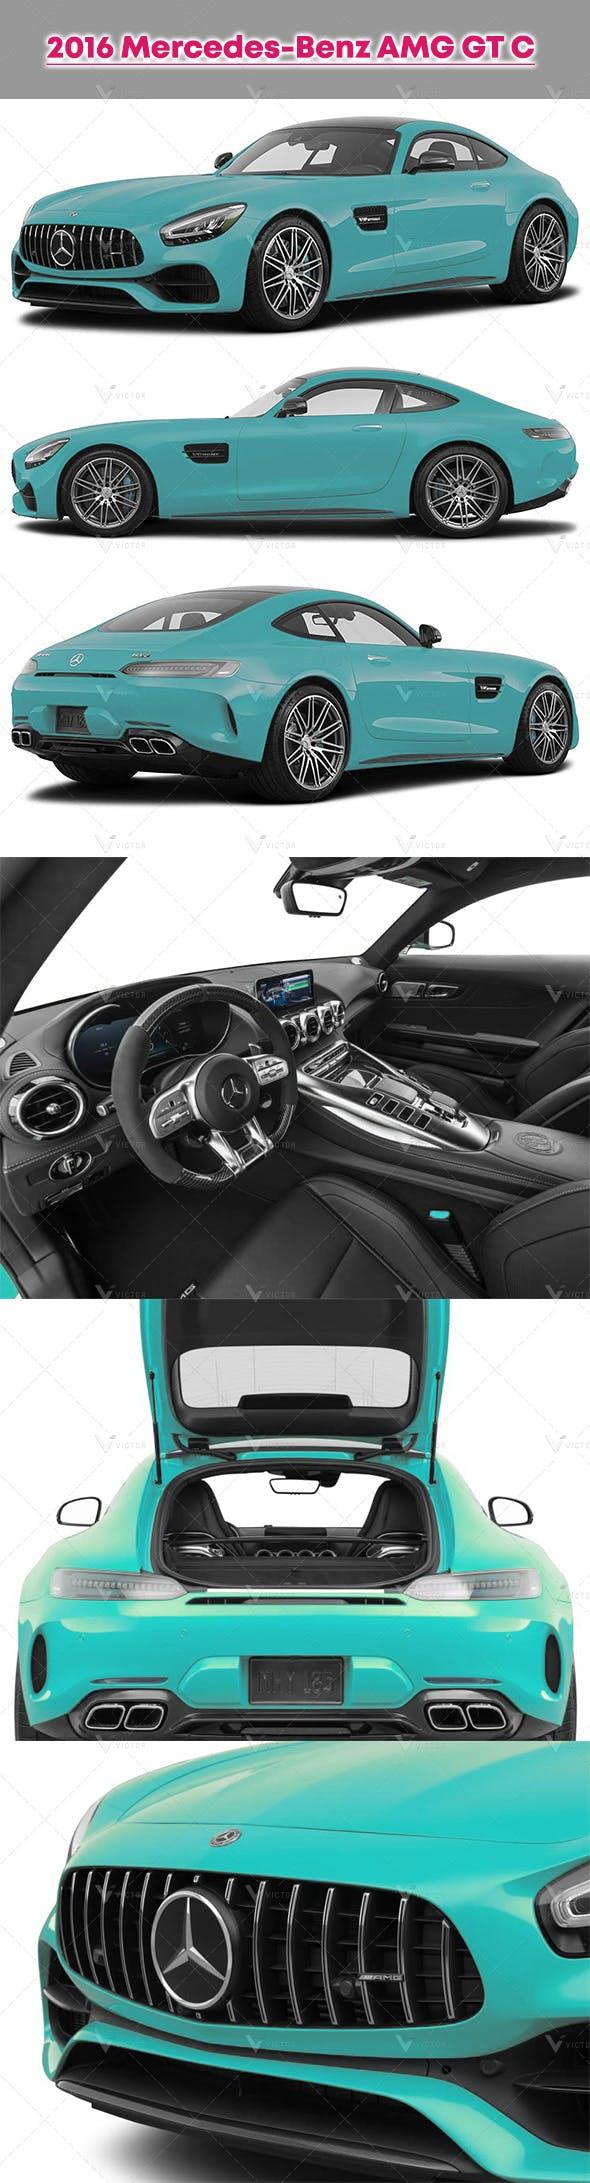 2016 Mercedes-Benz AMG GT C - 3DOcean Item for Sale